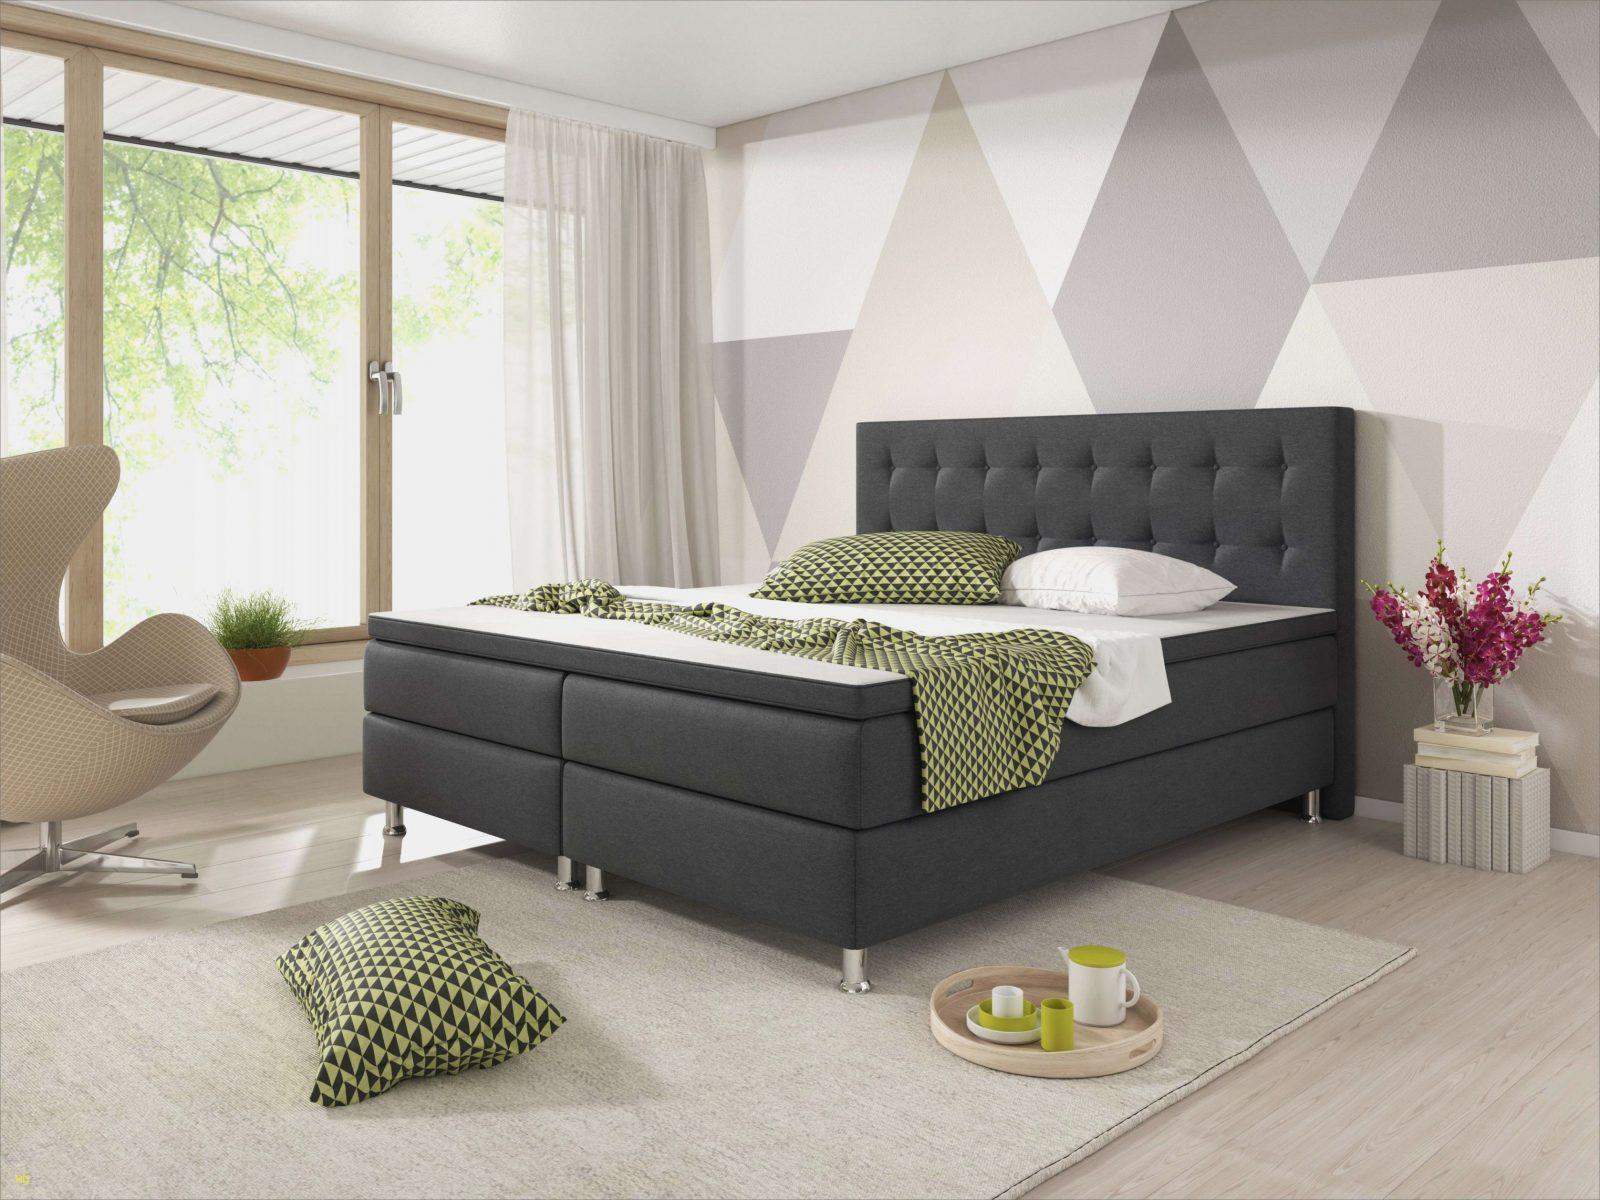 Vintage Bett Neu Wohnideen Bett Selber Bauen Kreativ Mit Schön Bett von Bett Selber Bauen Kreativ Bild